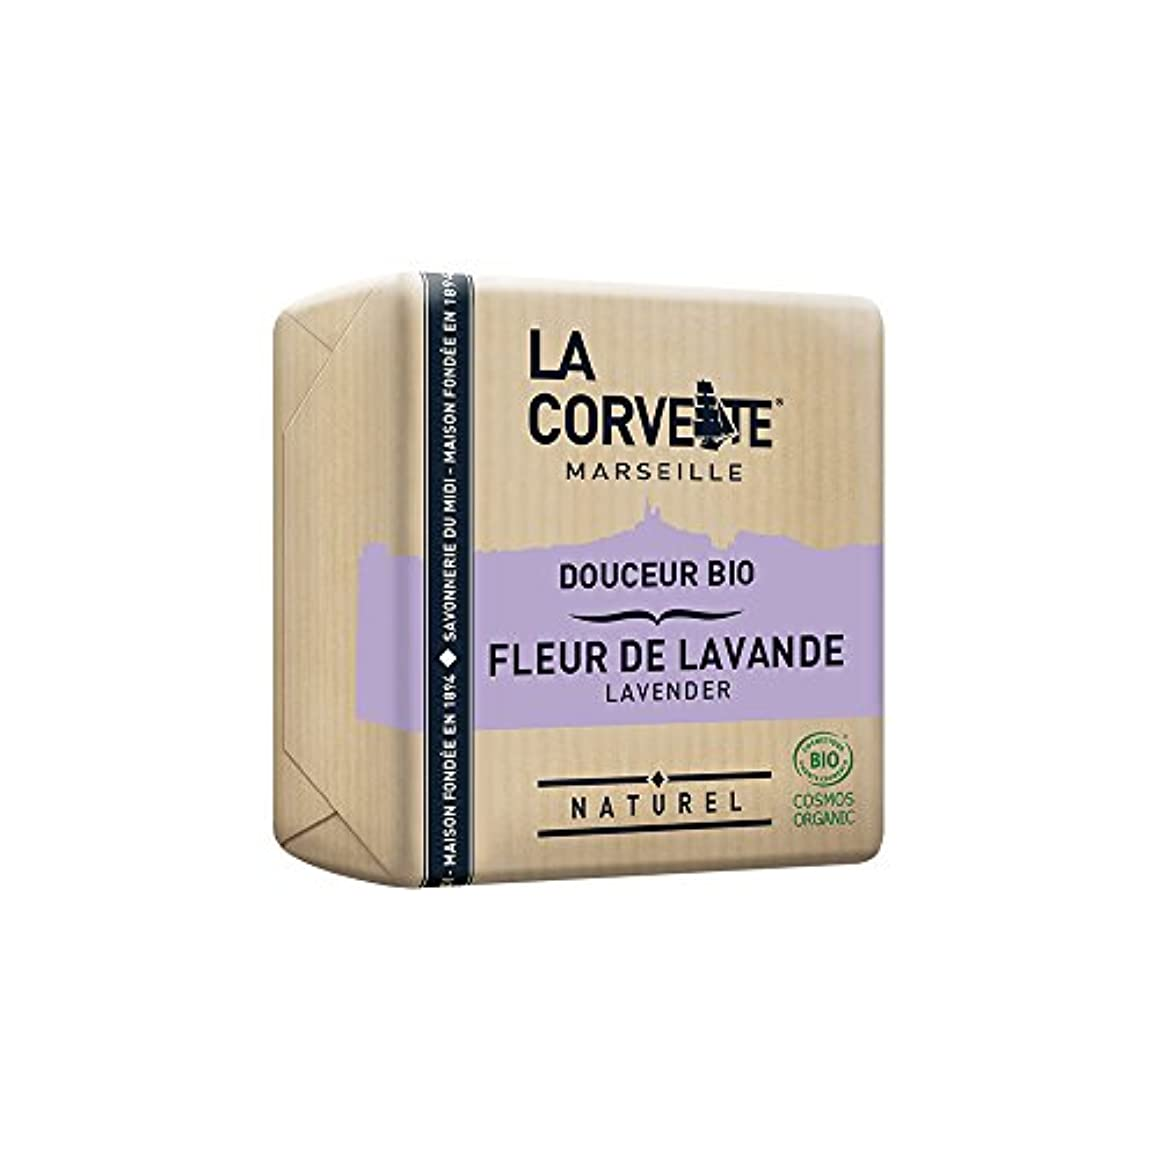 La Corvette(ラ?コルベット) サボン?ドゥスール?ビオ ラベンダー 100g